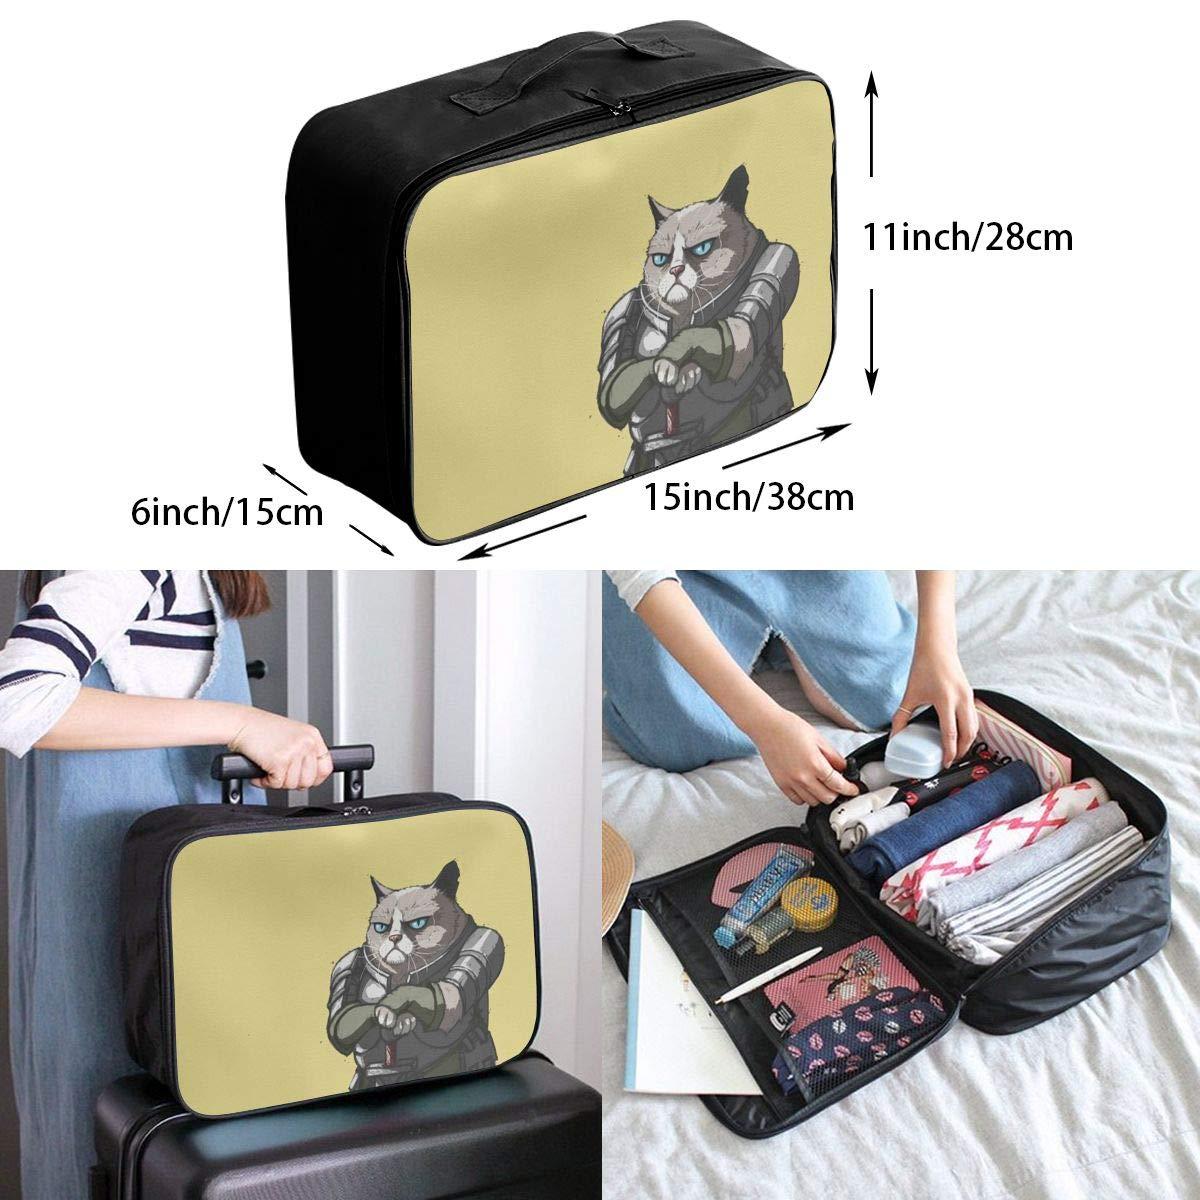 Grumpy Cat Japanese Bushido Travel Lightweight Waterproof Folding Storage Portable Luggage Duffle Tote Bag Large Capacity In Trolley Handle Bags 6x11x15 Inch